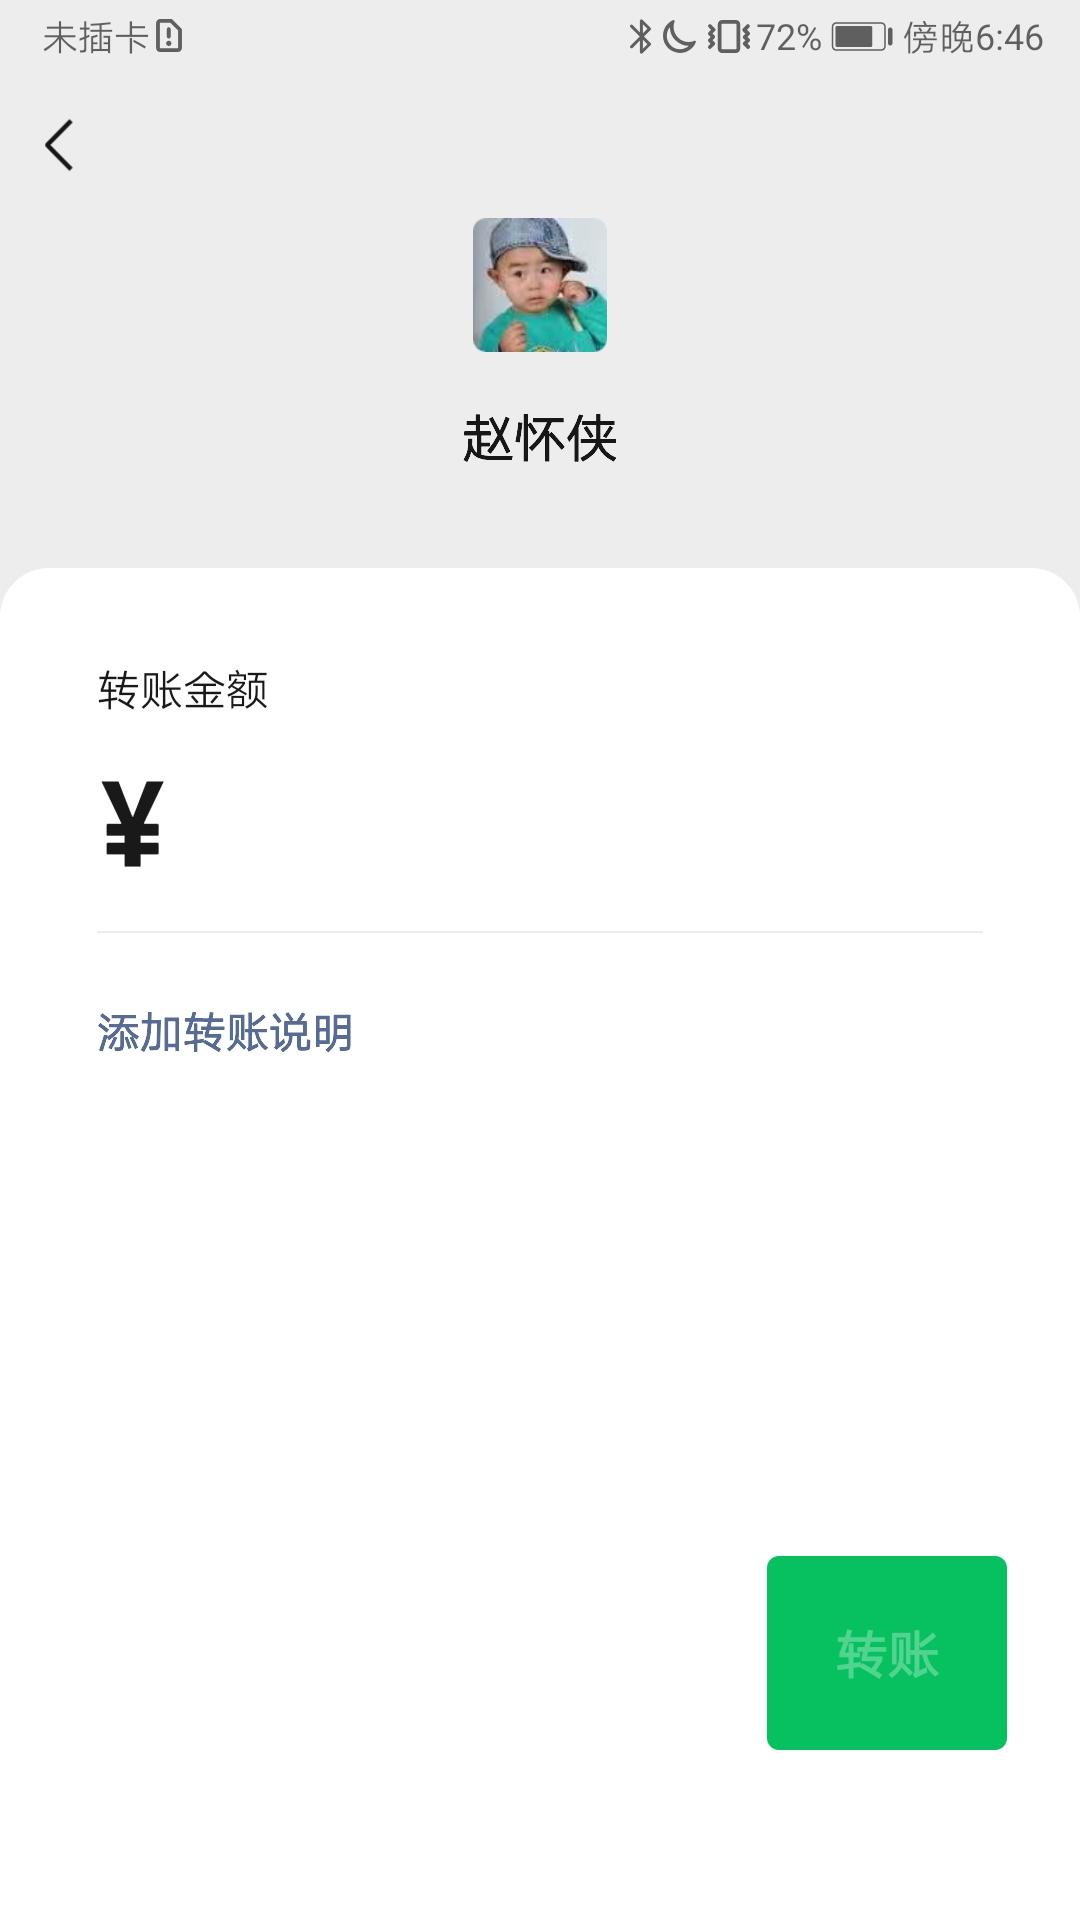 Screenshot_20210912_184659_com.tencent.mm.jpg